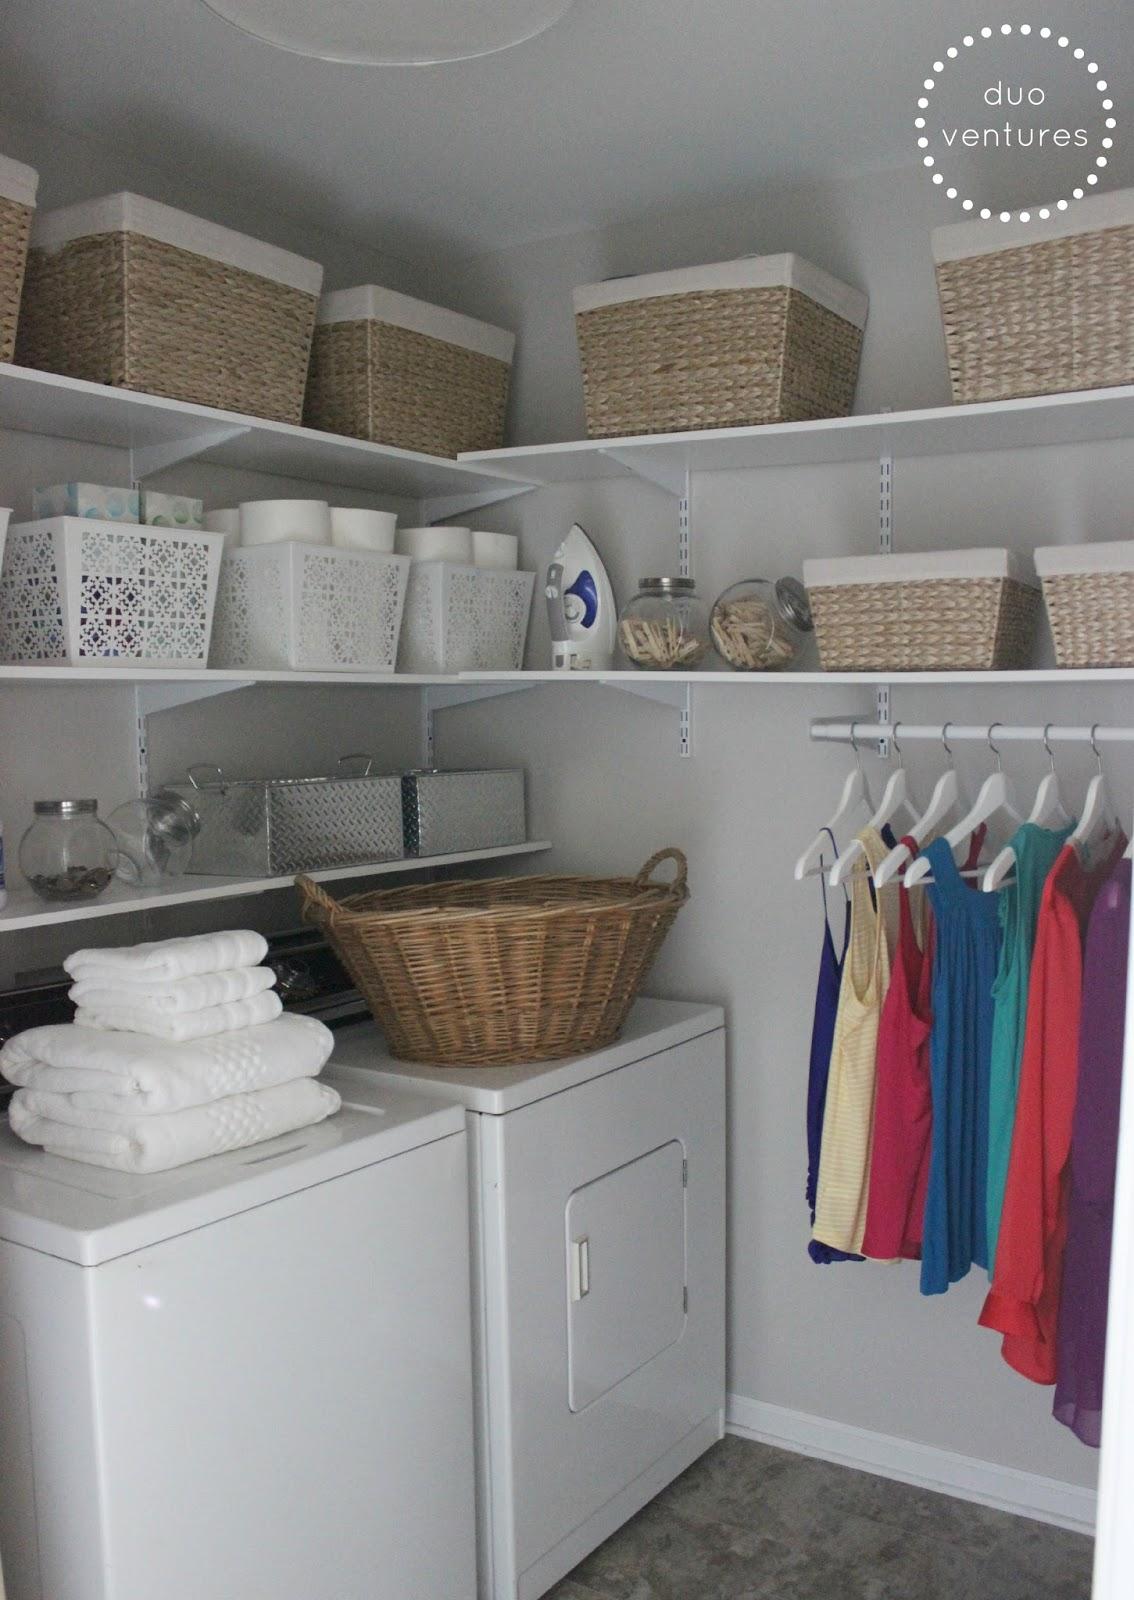 explore duo ventures laundry room makeover